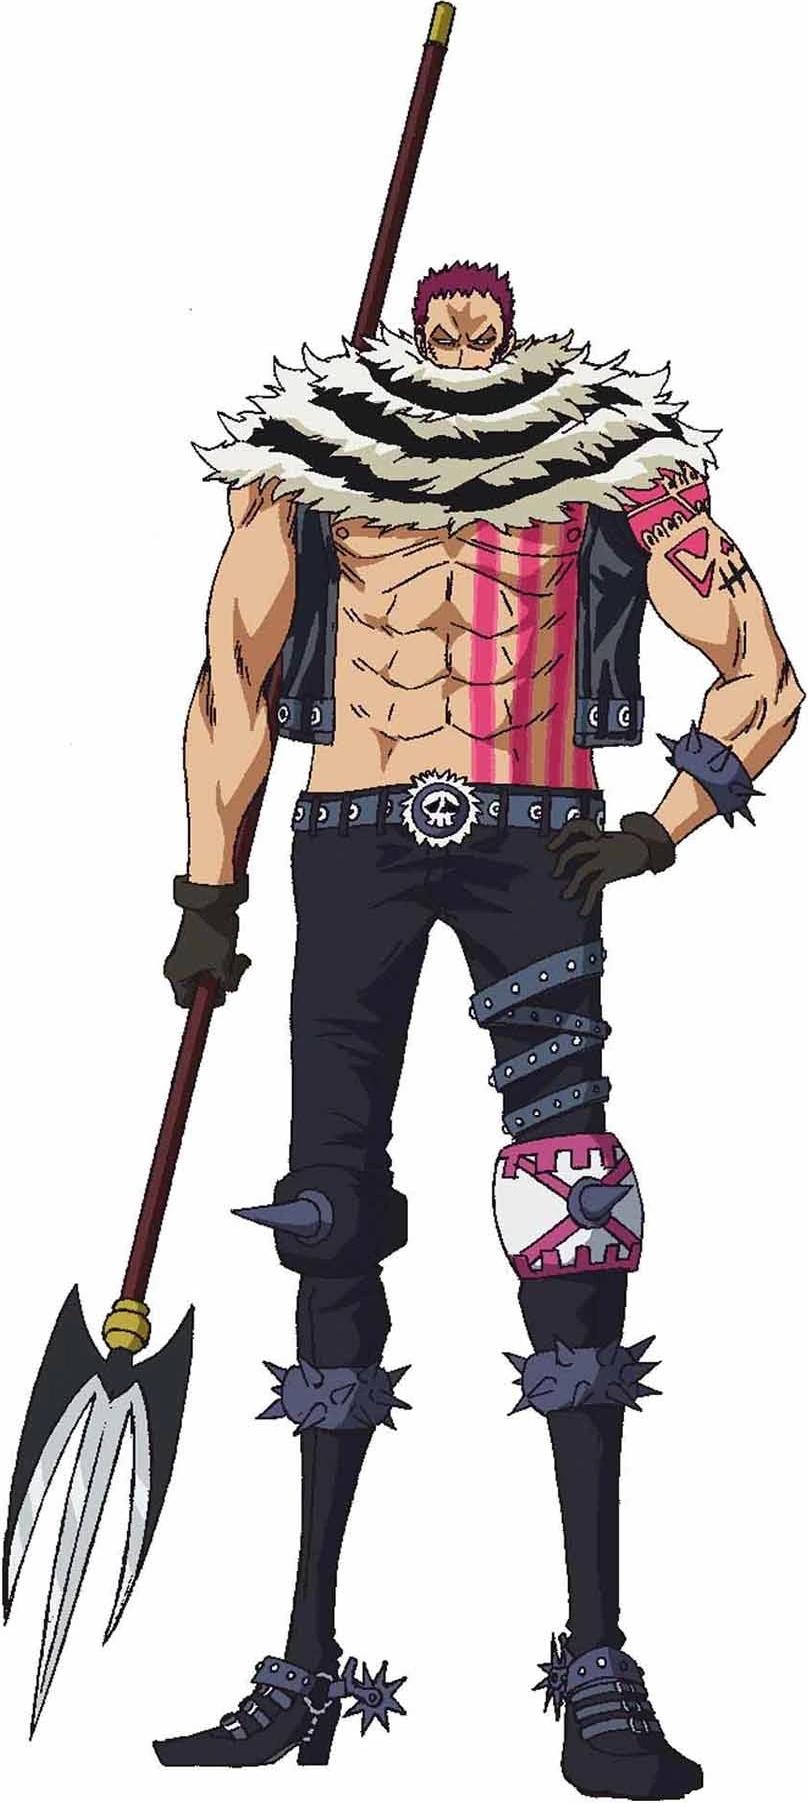 Image - Katakuri Anime Concept Art.png | One Piece Wiki | FANDOM powered by Wikia